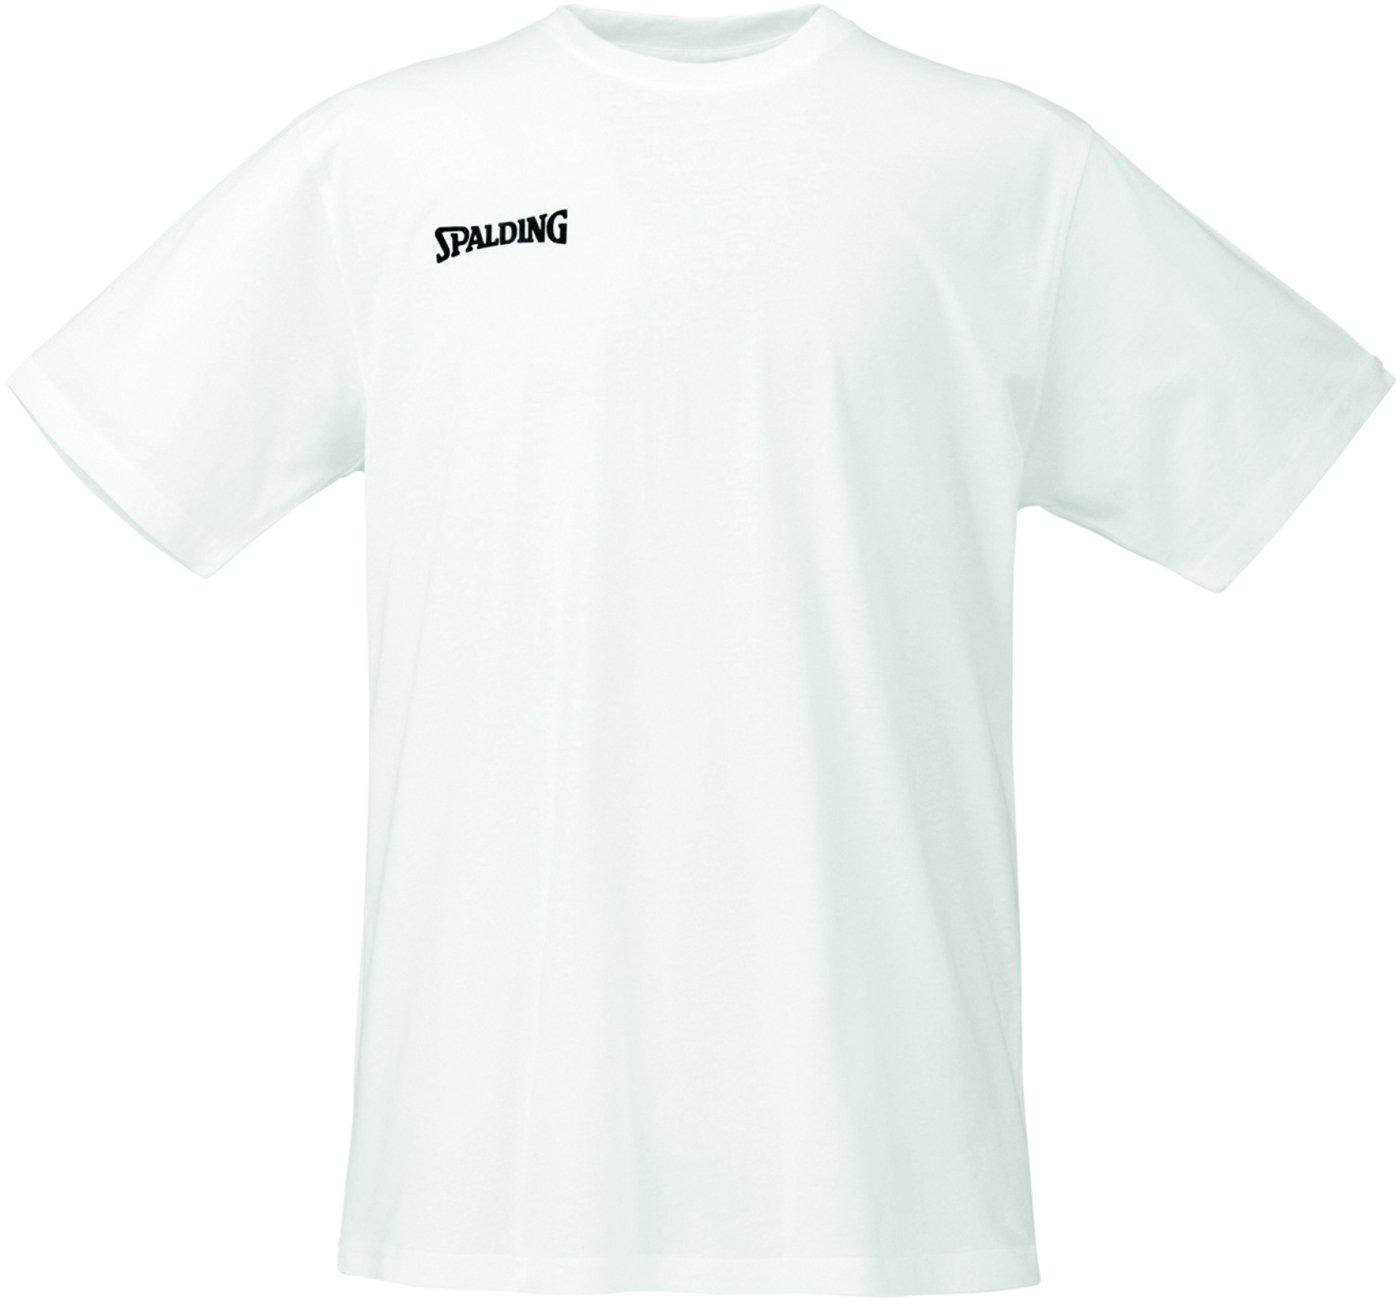 T-shirt Spalding Basic